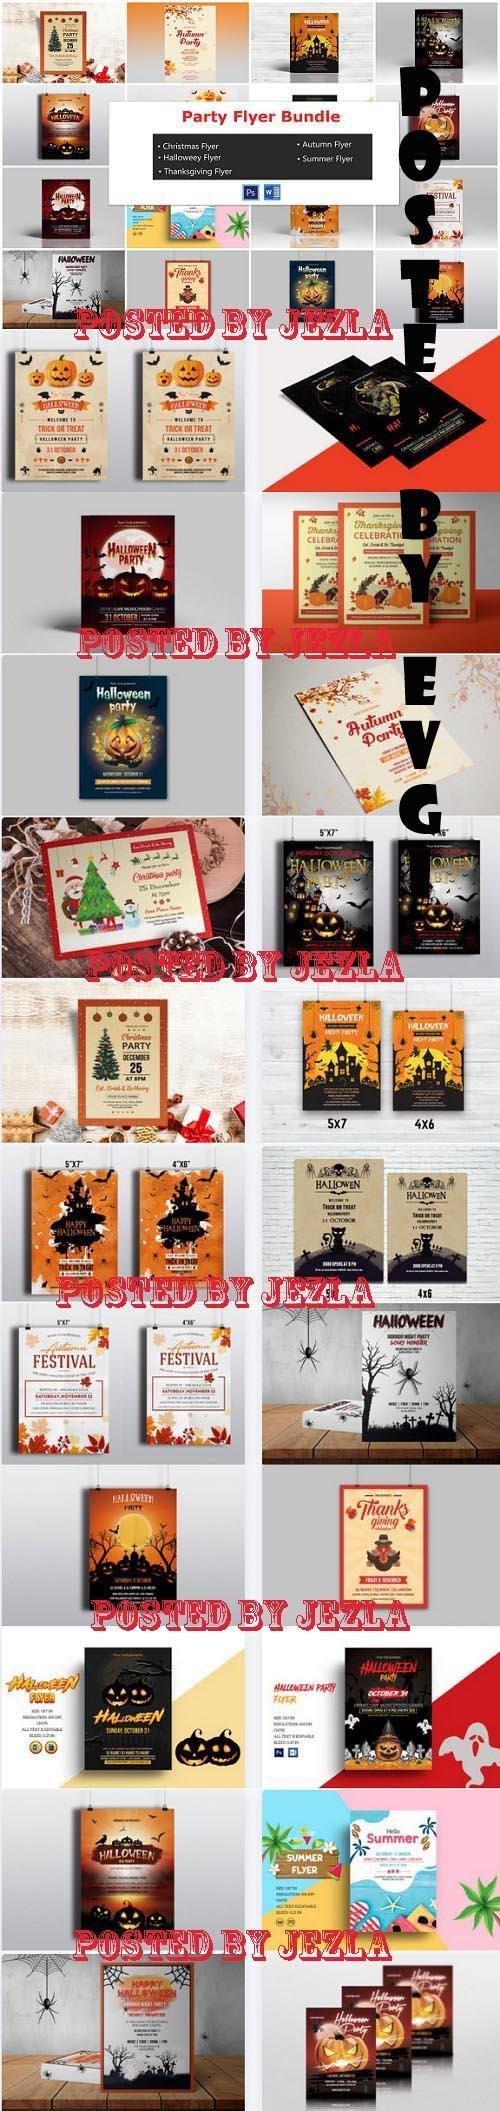 Printable Party Flyer Bundle - 22 Premium Graphics